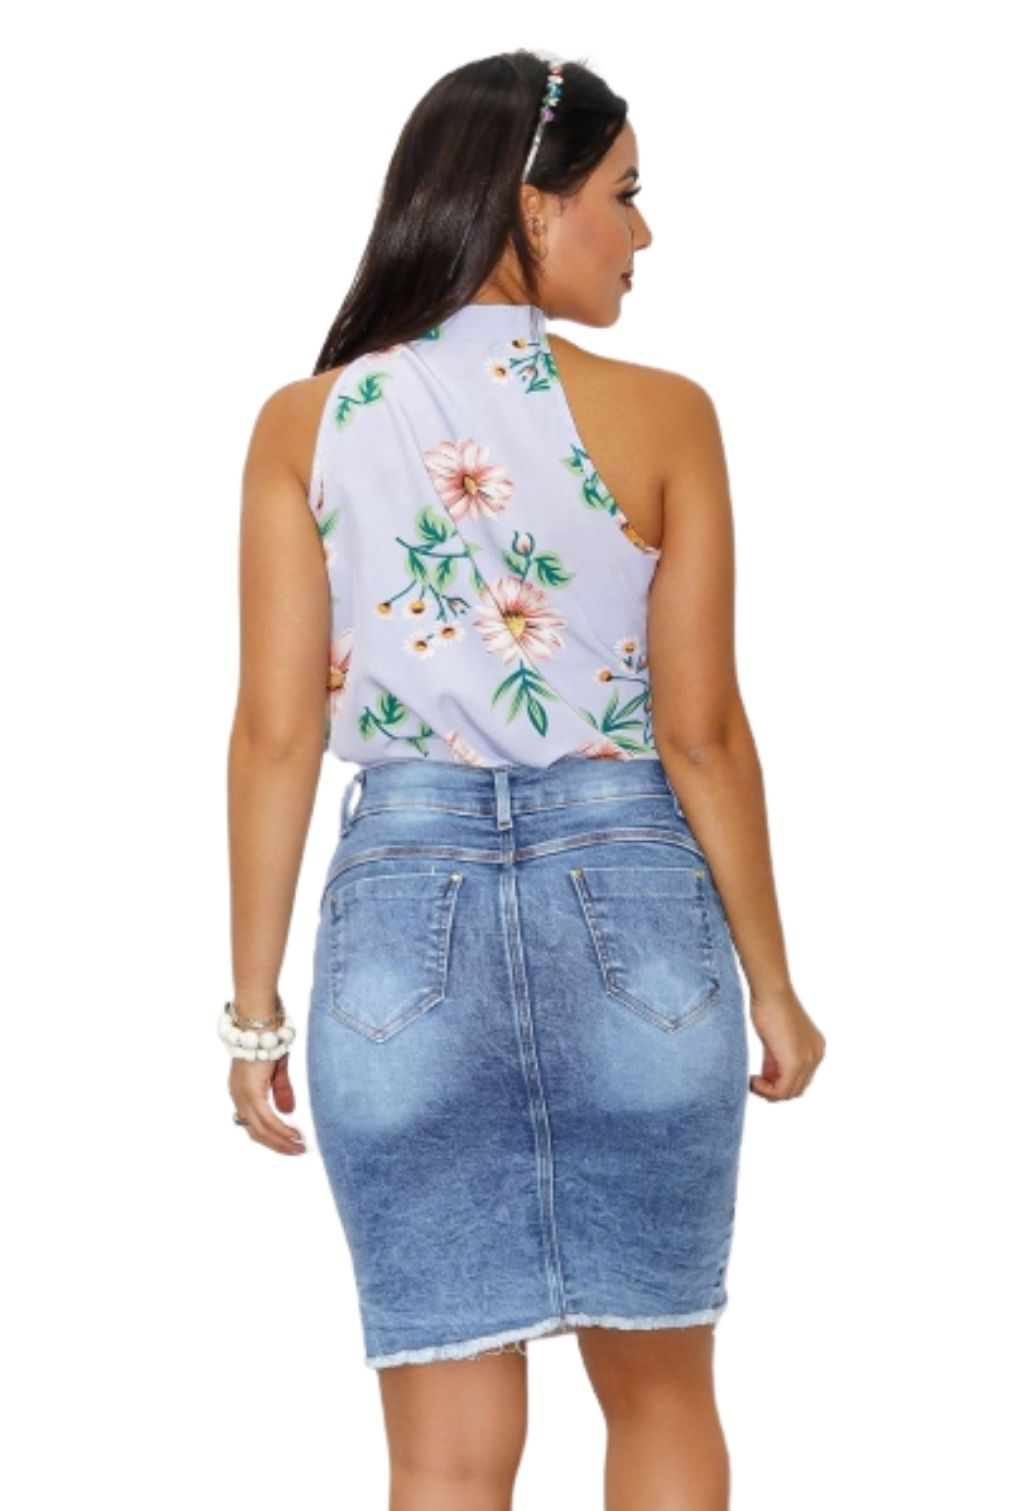 Blusa Camisa Regata Feminina Laço Pescoço Gola Alta Social Floral  - ModaStore | Moda Feminina